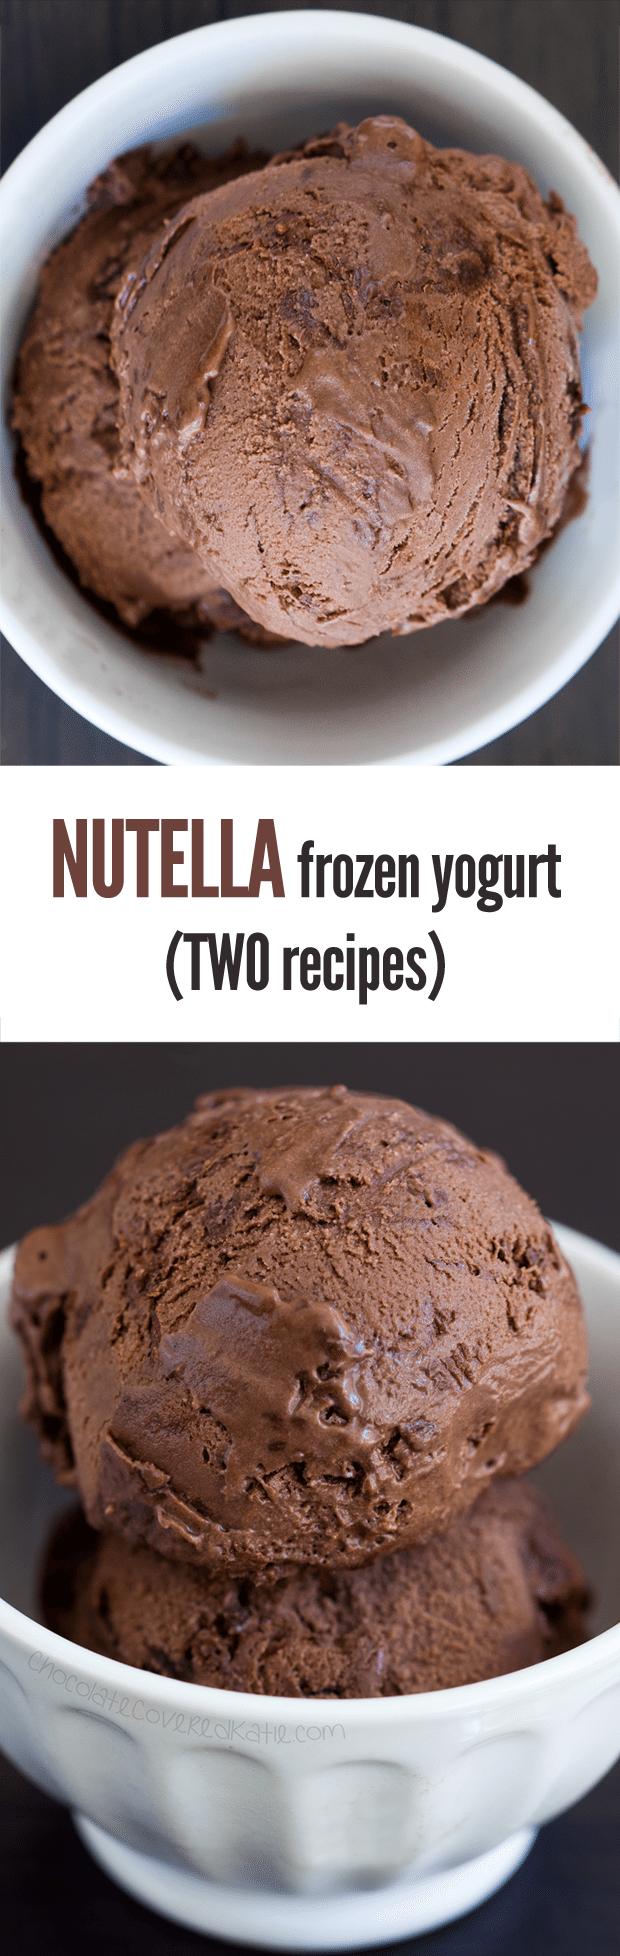 Nutella Frozen Yogurt - Two Recipes!